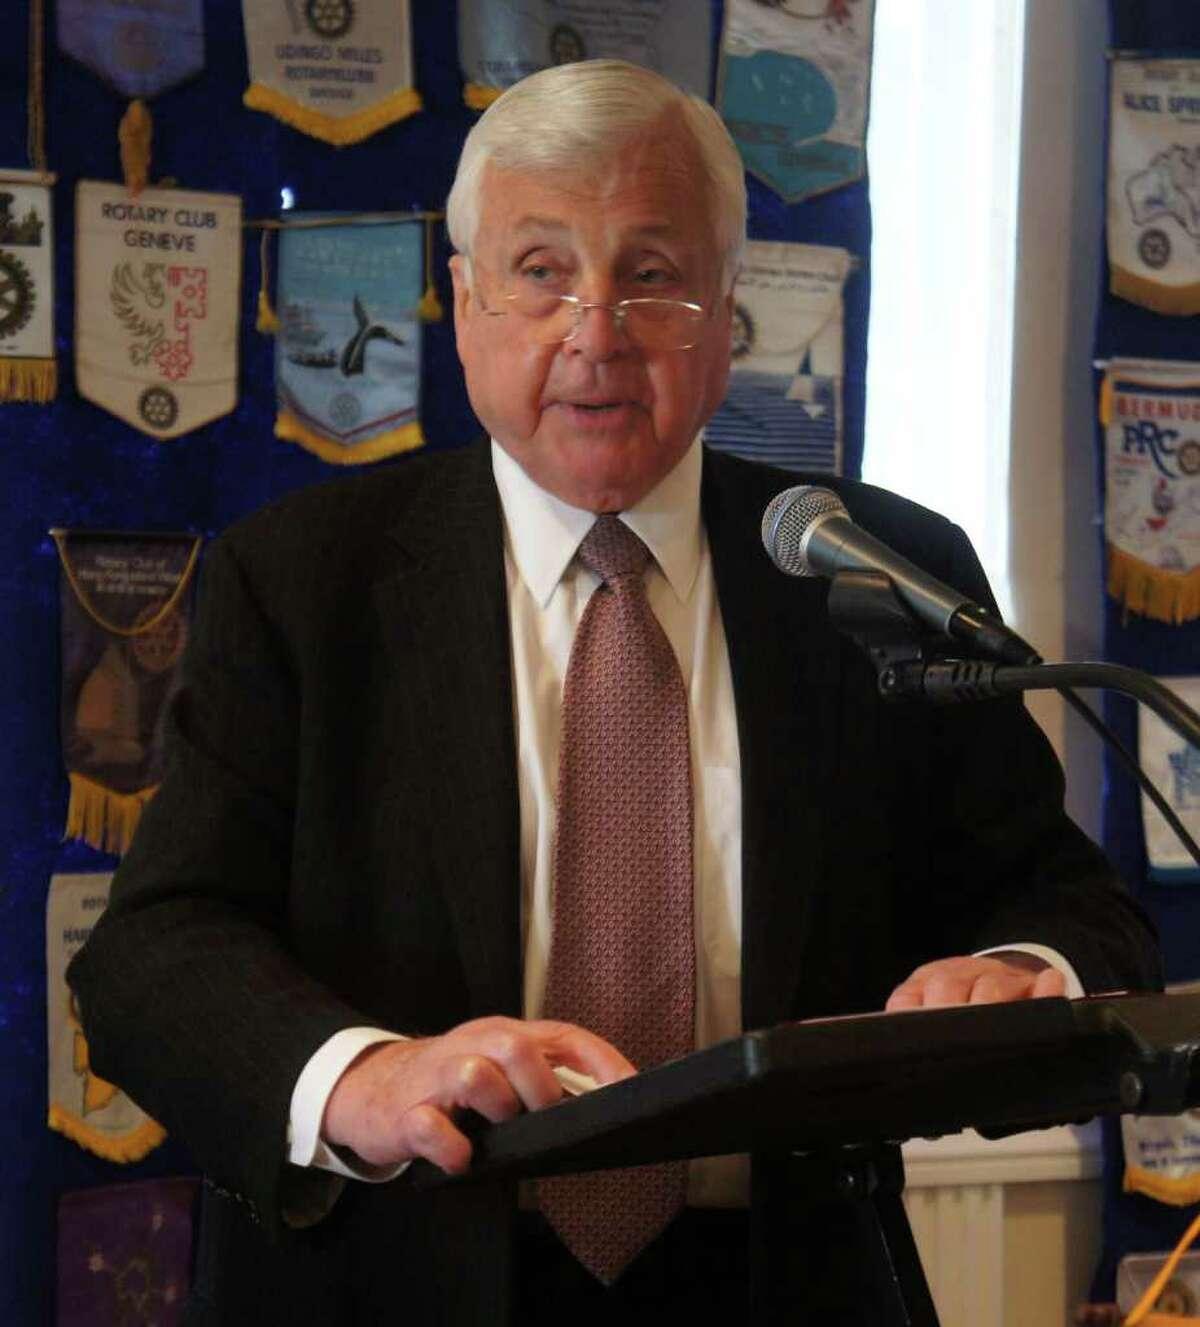 Superintendent of Schools Elliott Landon addresses the Westport Rotary Club at the Inn at Longshore on Tuesday, Oct. 25, 2011.